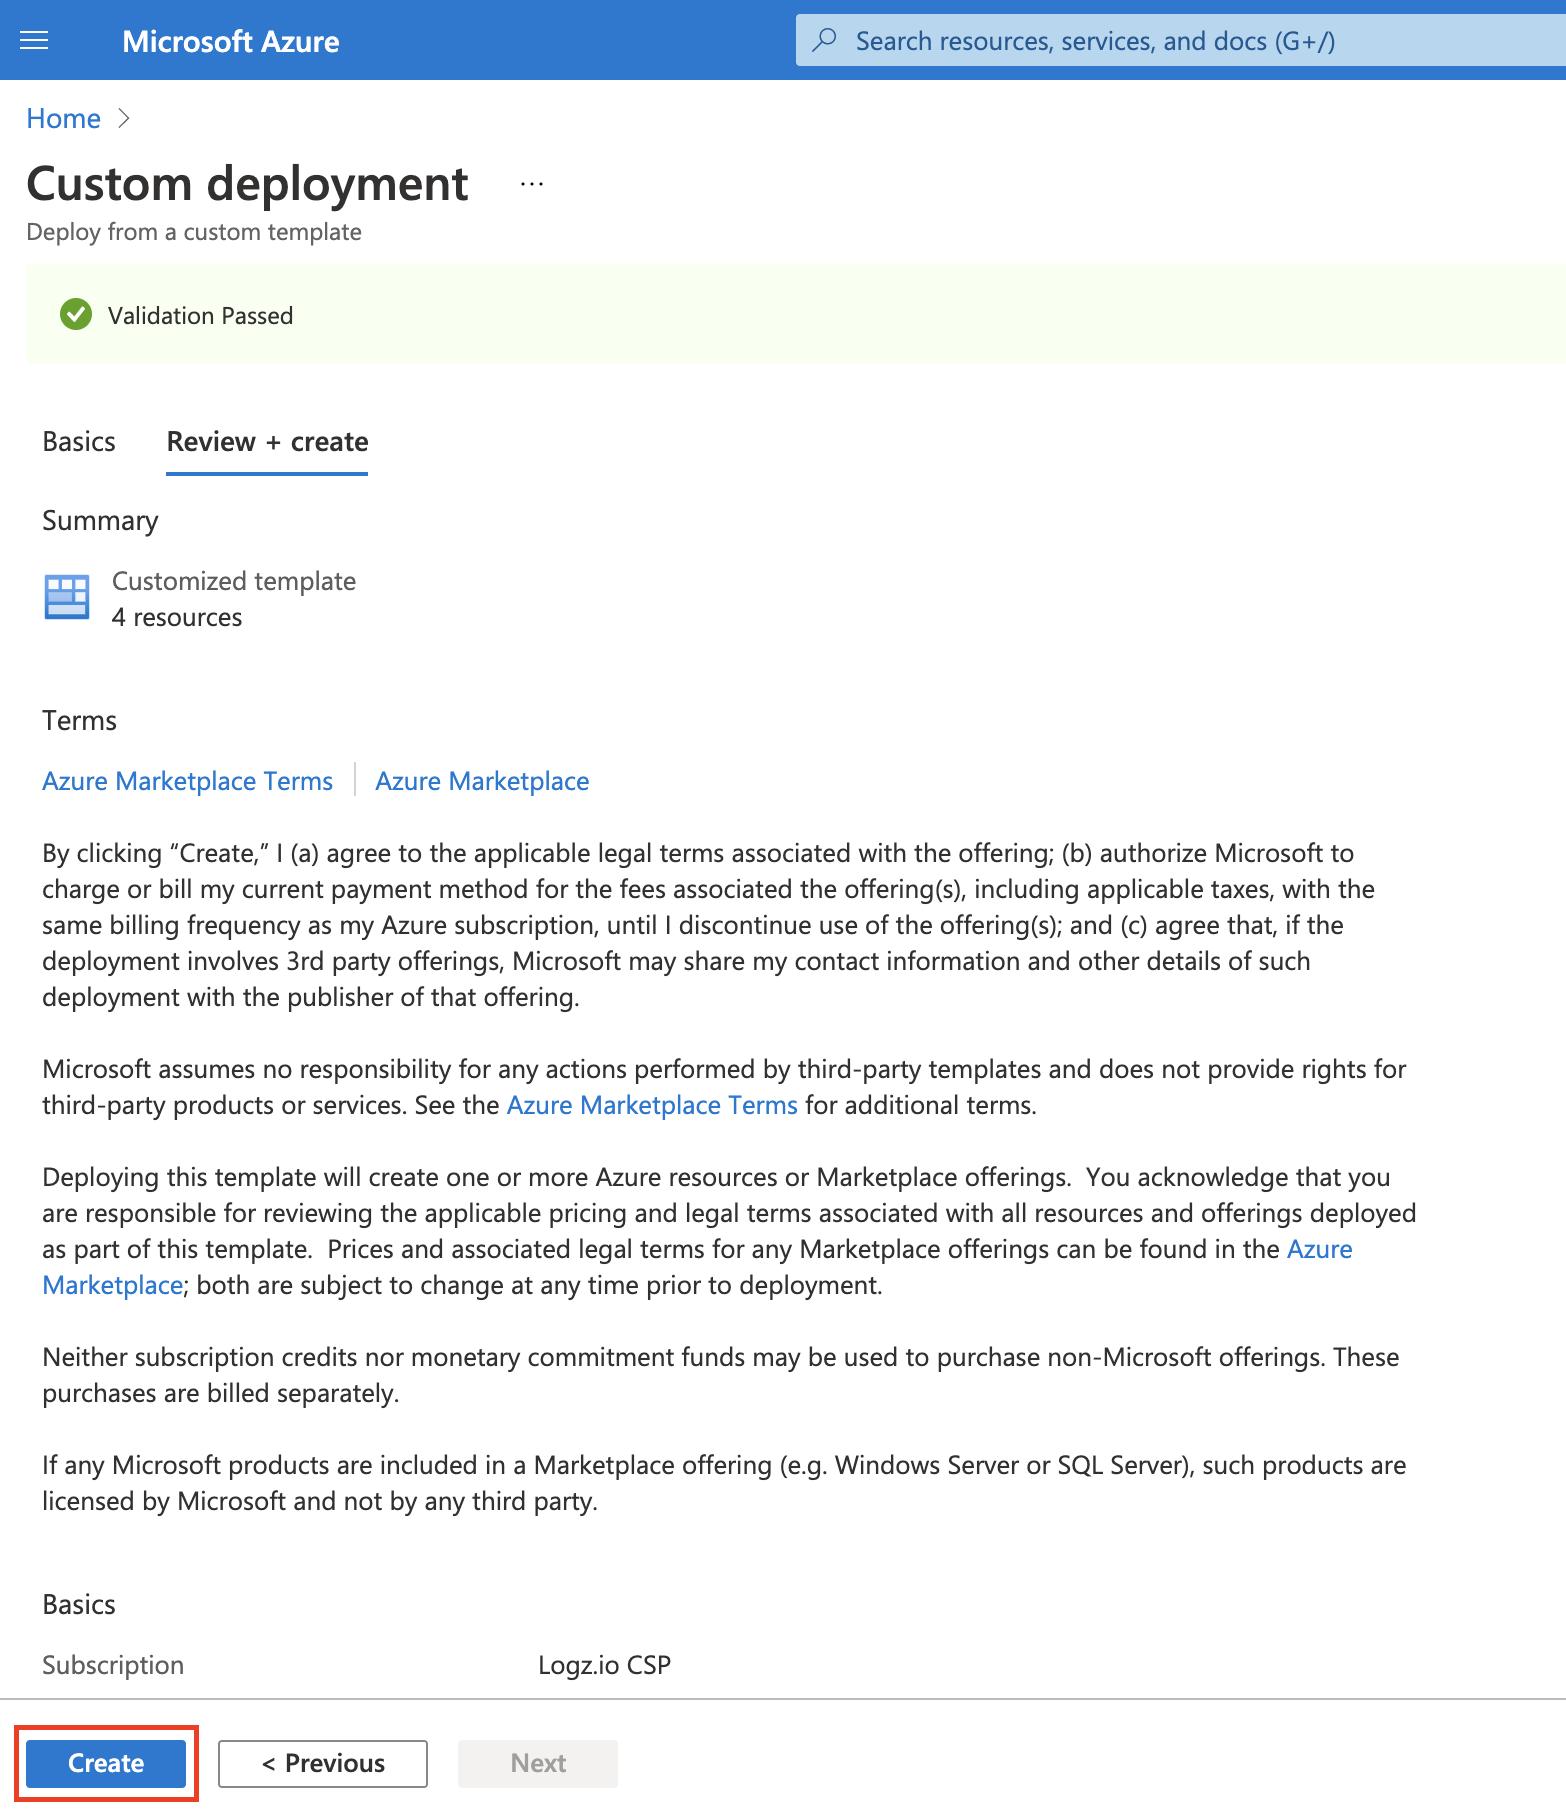 Custom deployment